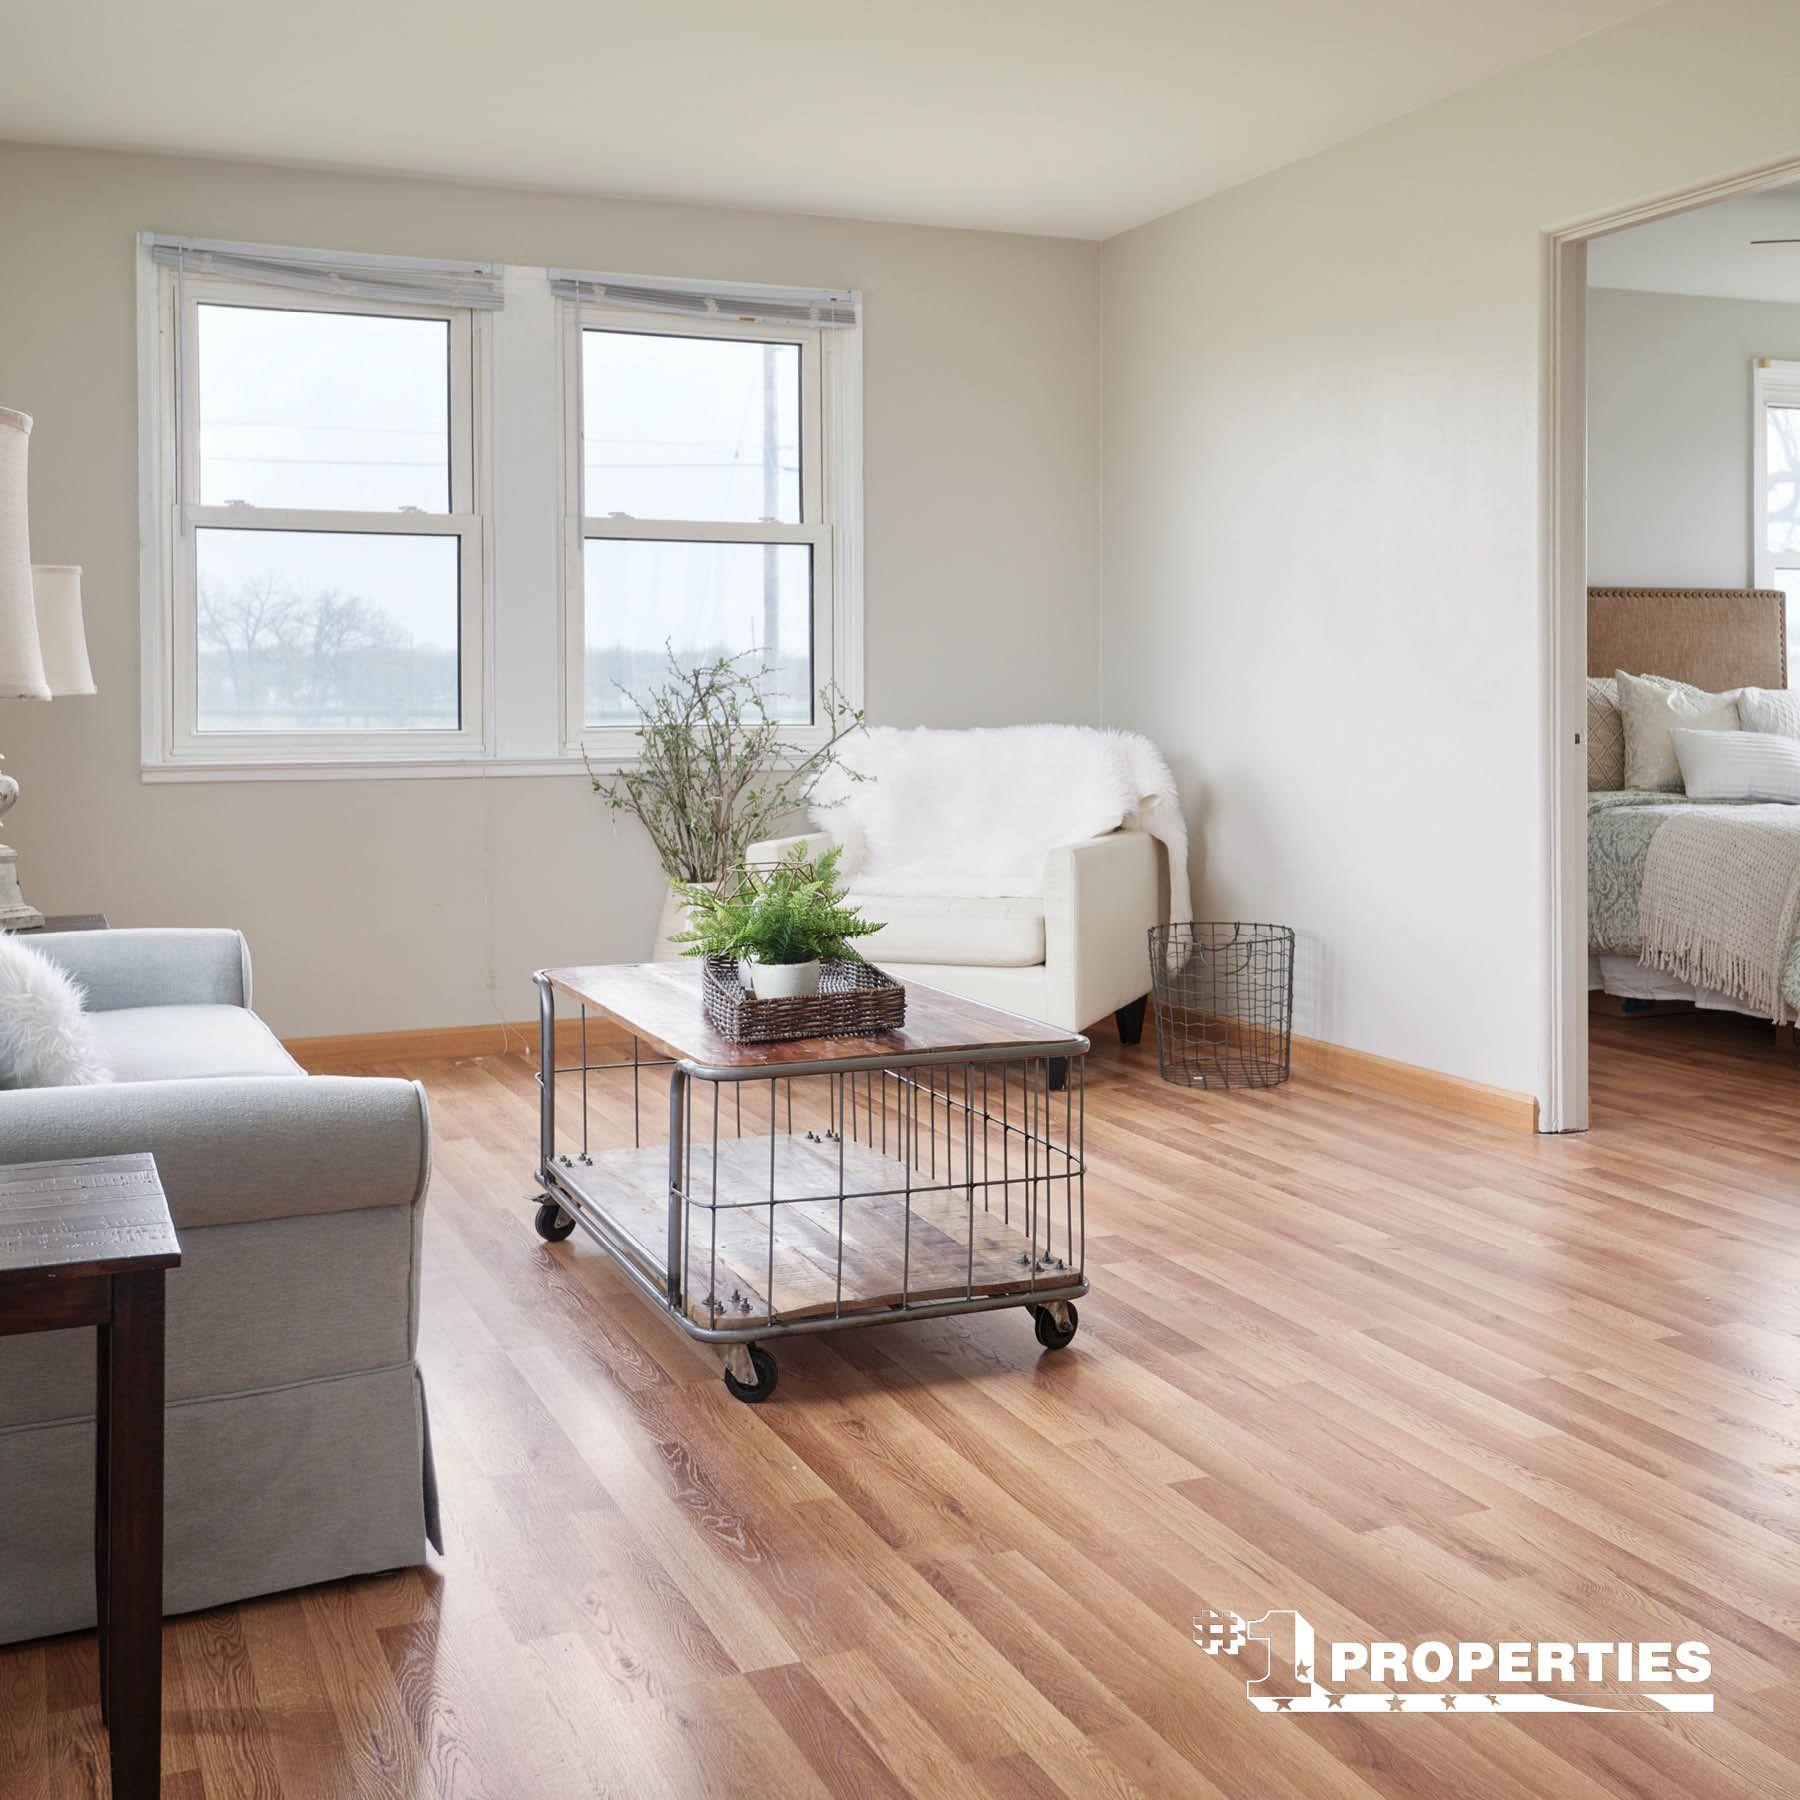 Charming One Level Living 3611 Van Buren Avenue Cheyenne